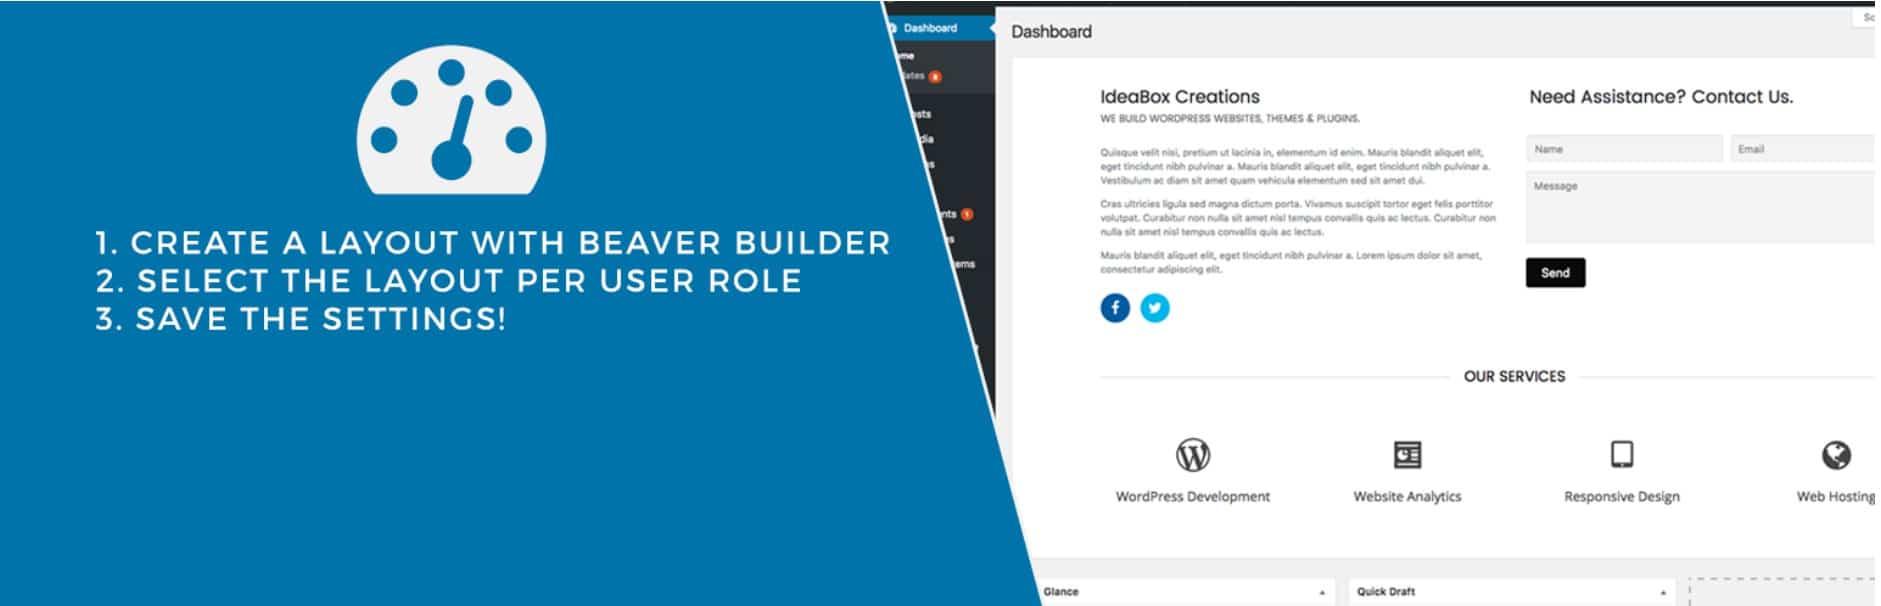 Beaver Builder dashboard welcome